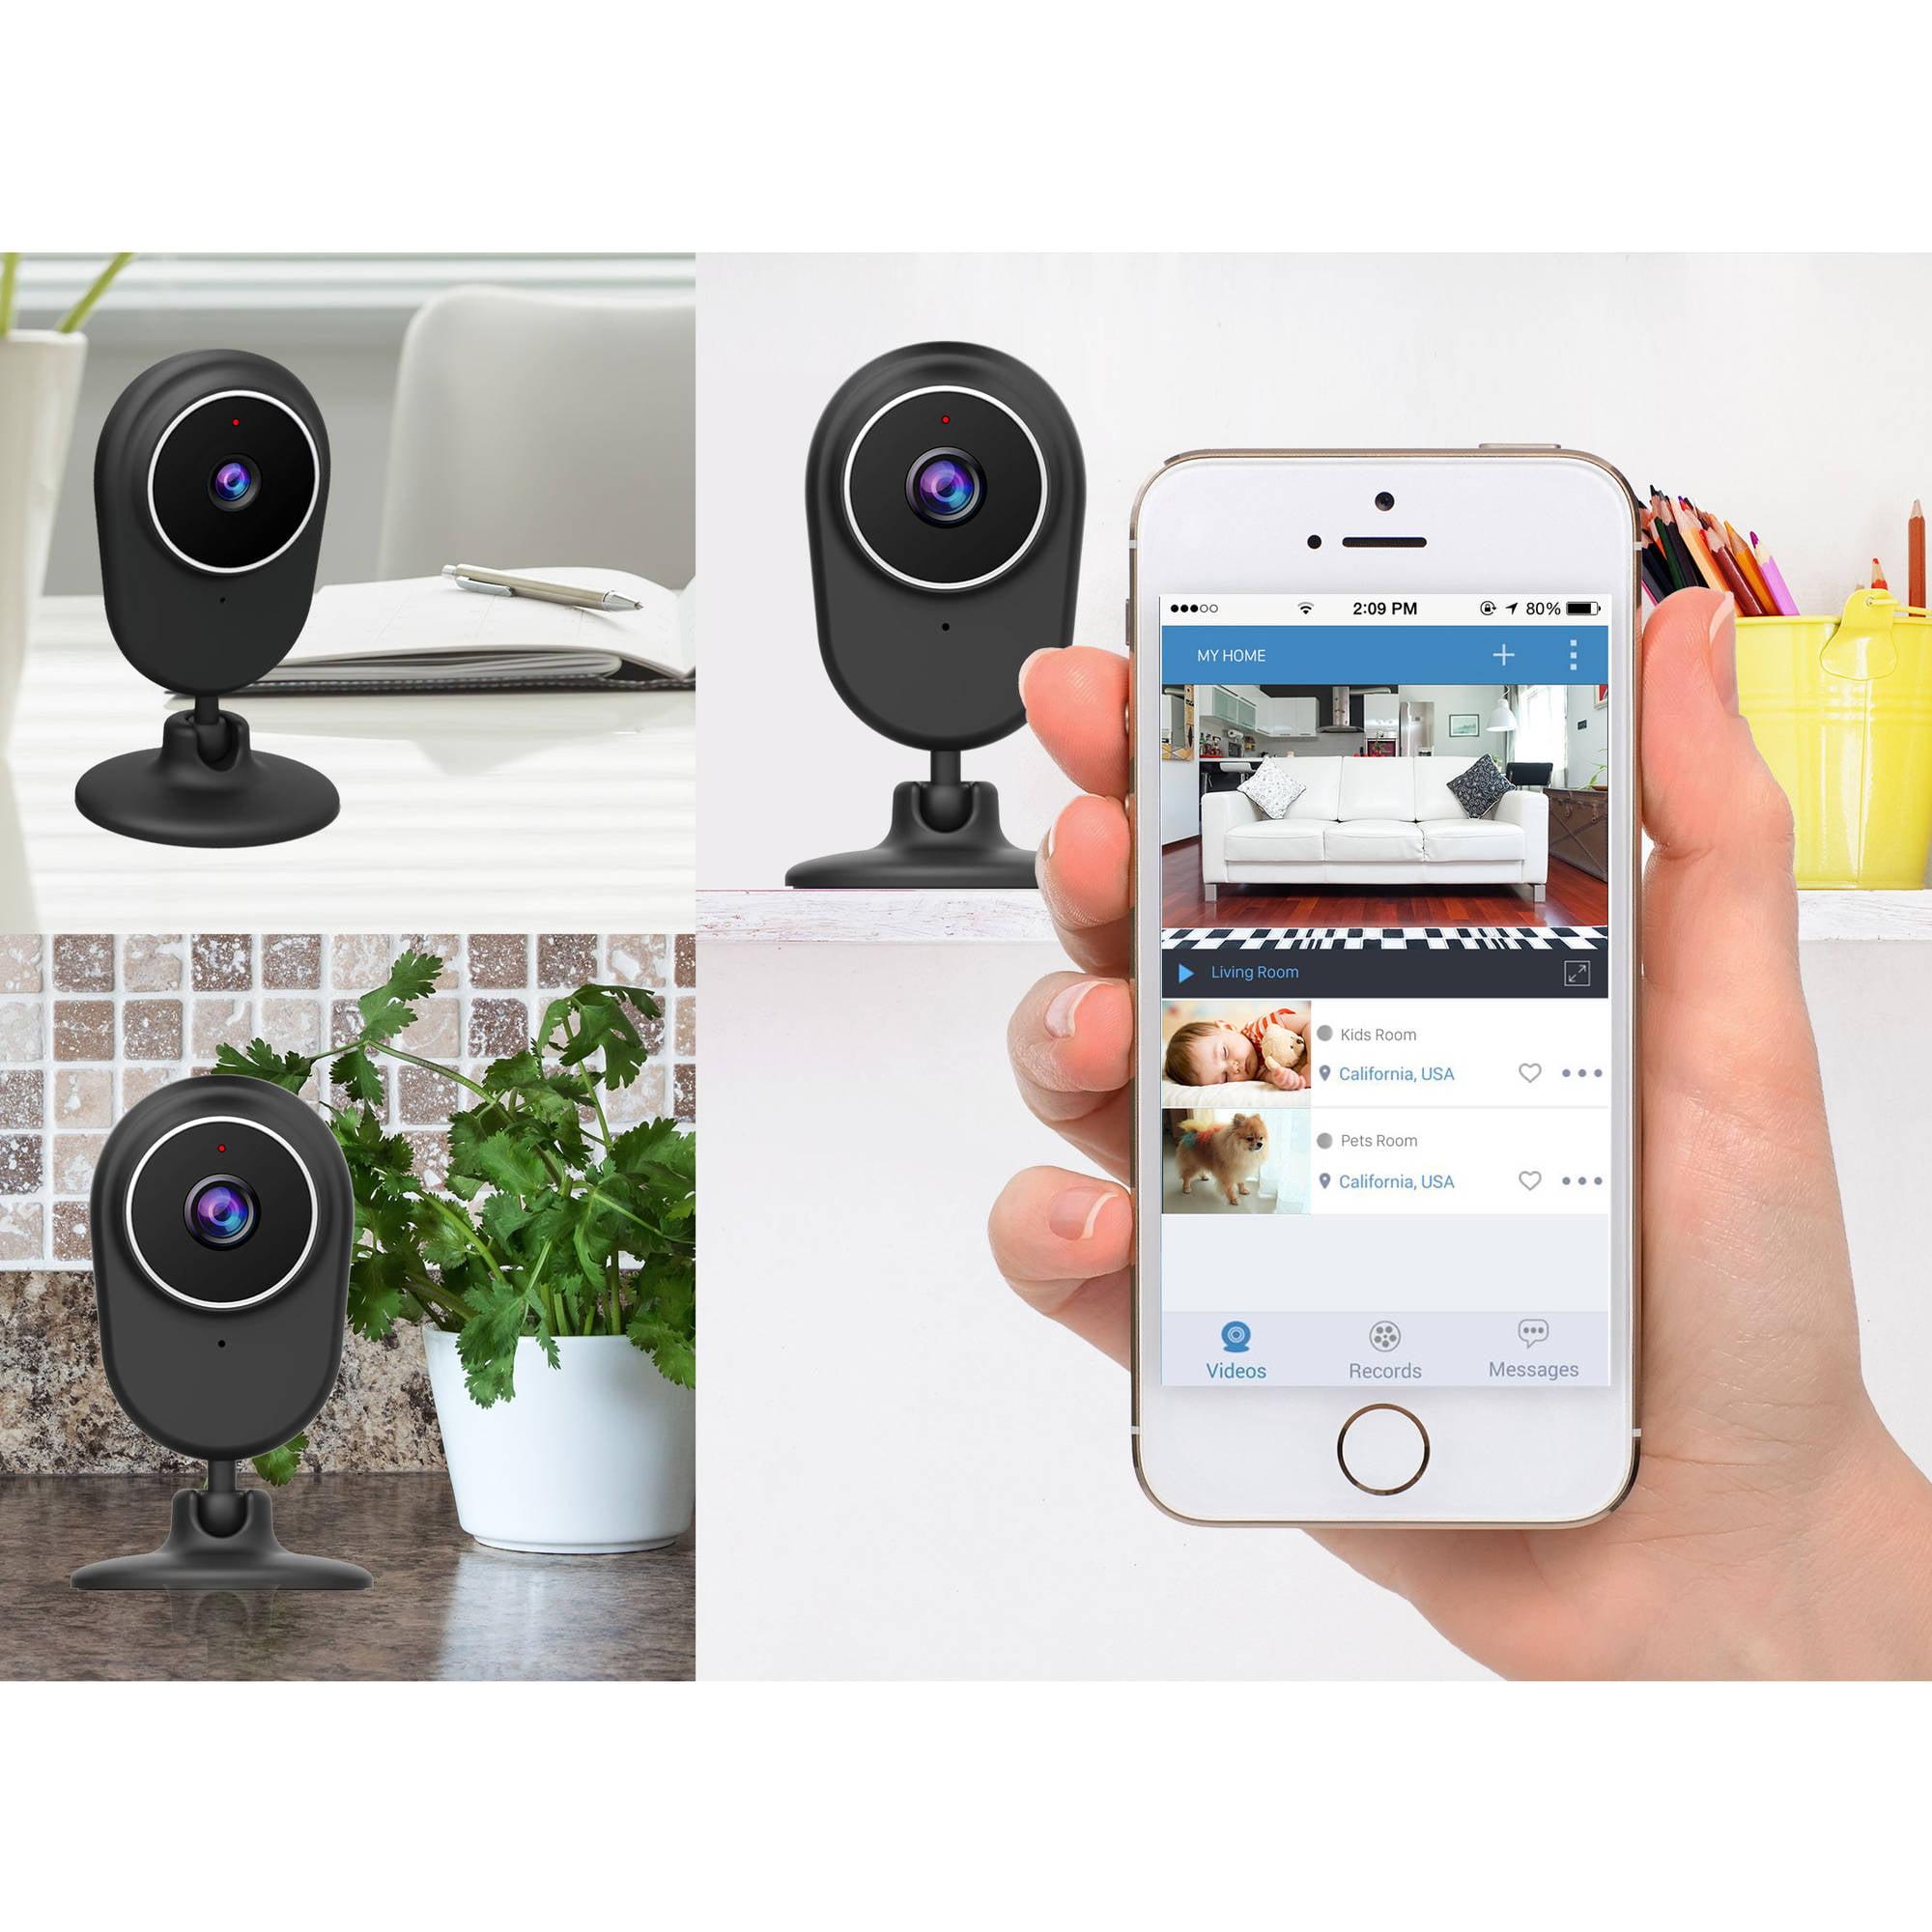 Momentum 720p WiFi Video Audio Monitoring Camera - Walmart.com